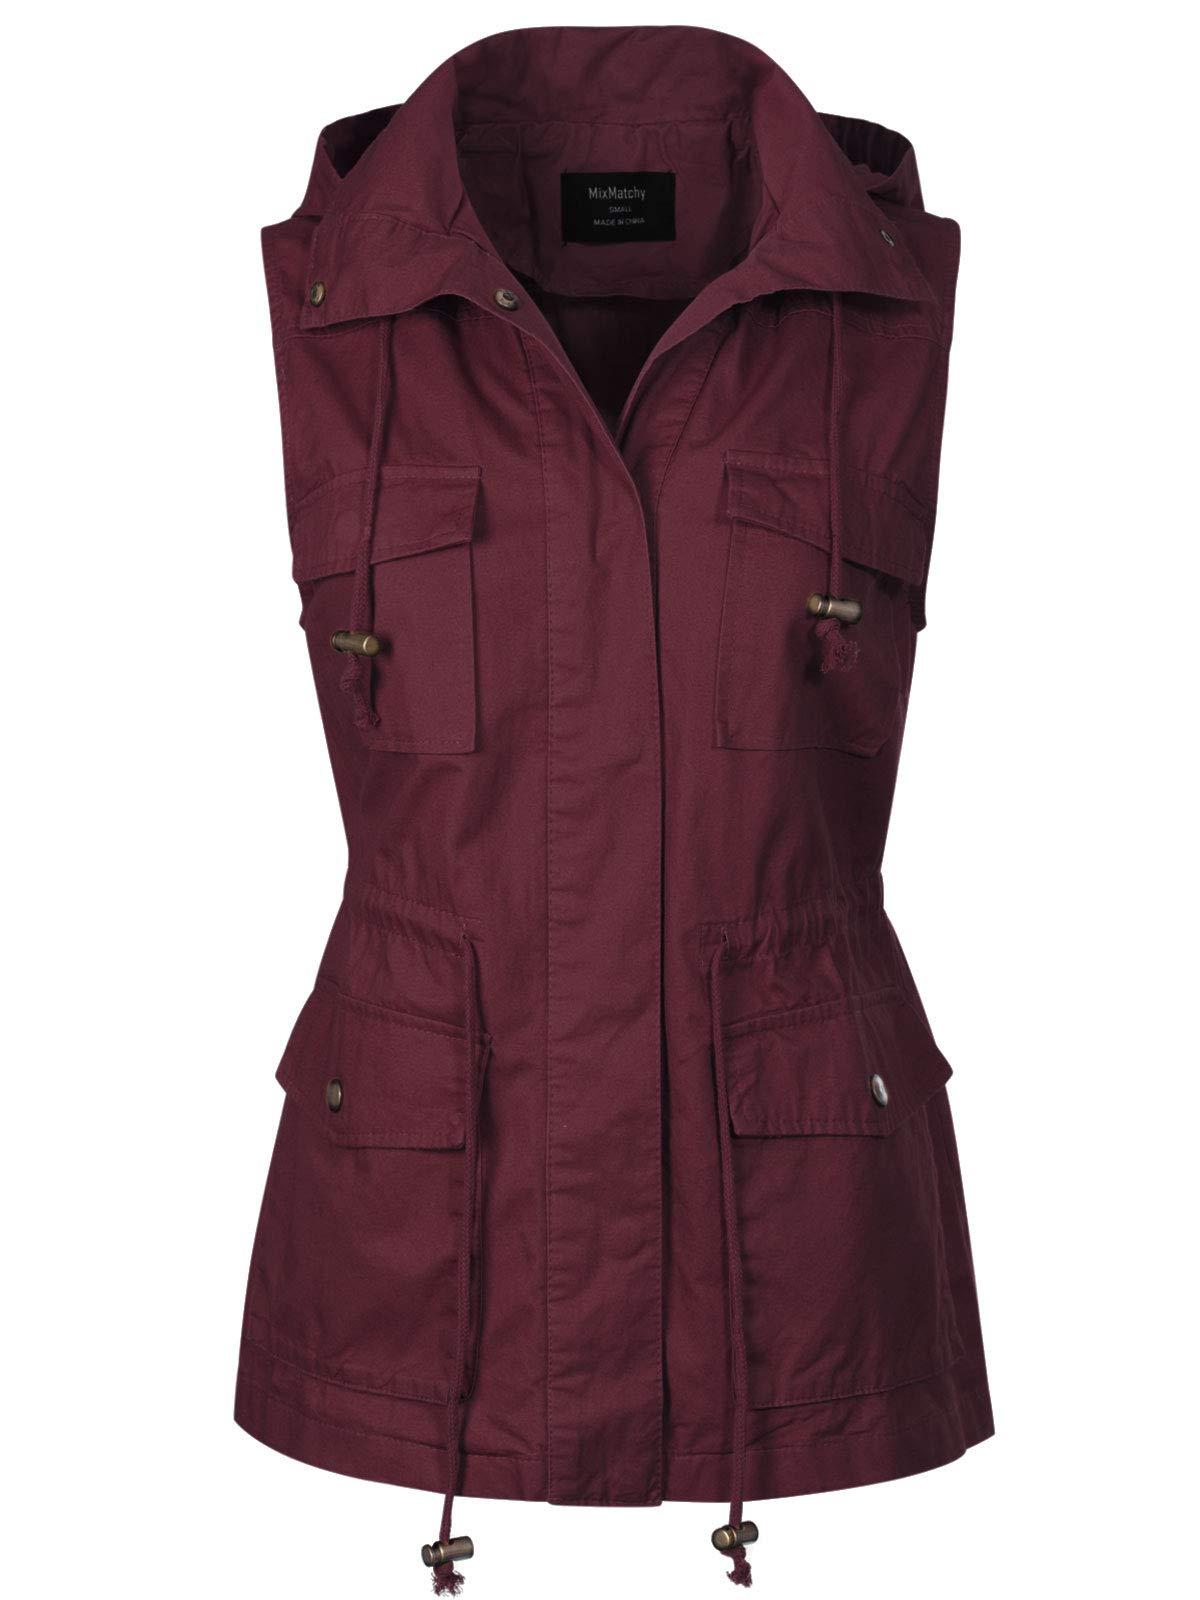 MixMatchy Women's Drawstring Lightweight Loose Fit Sleeveless Vest Utility Jacket Wine XL by MixMatchy